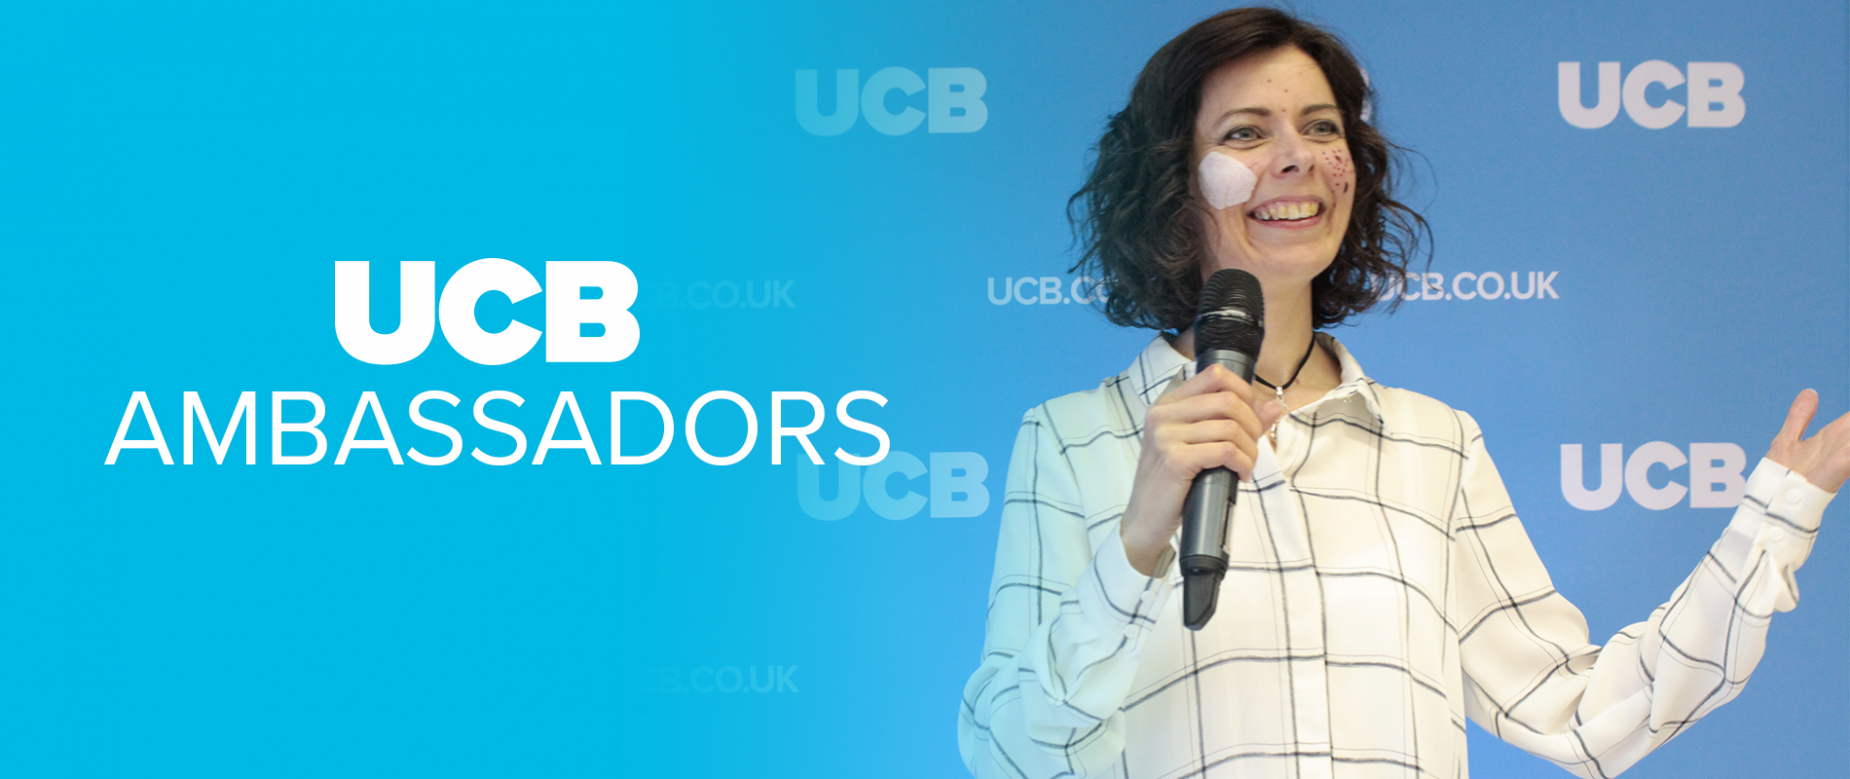 UCB Ambassadors